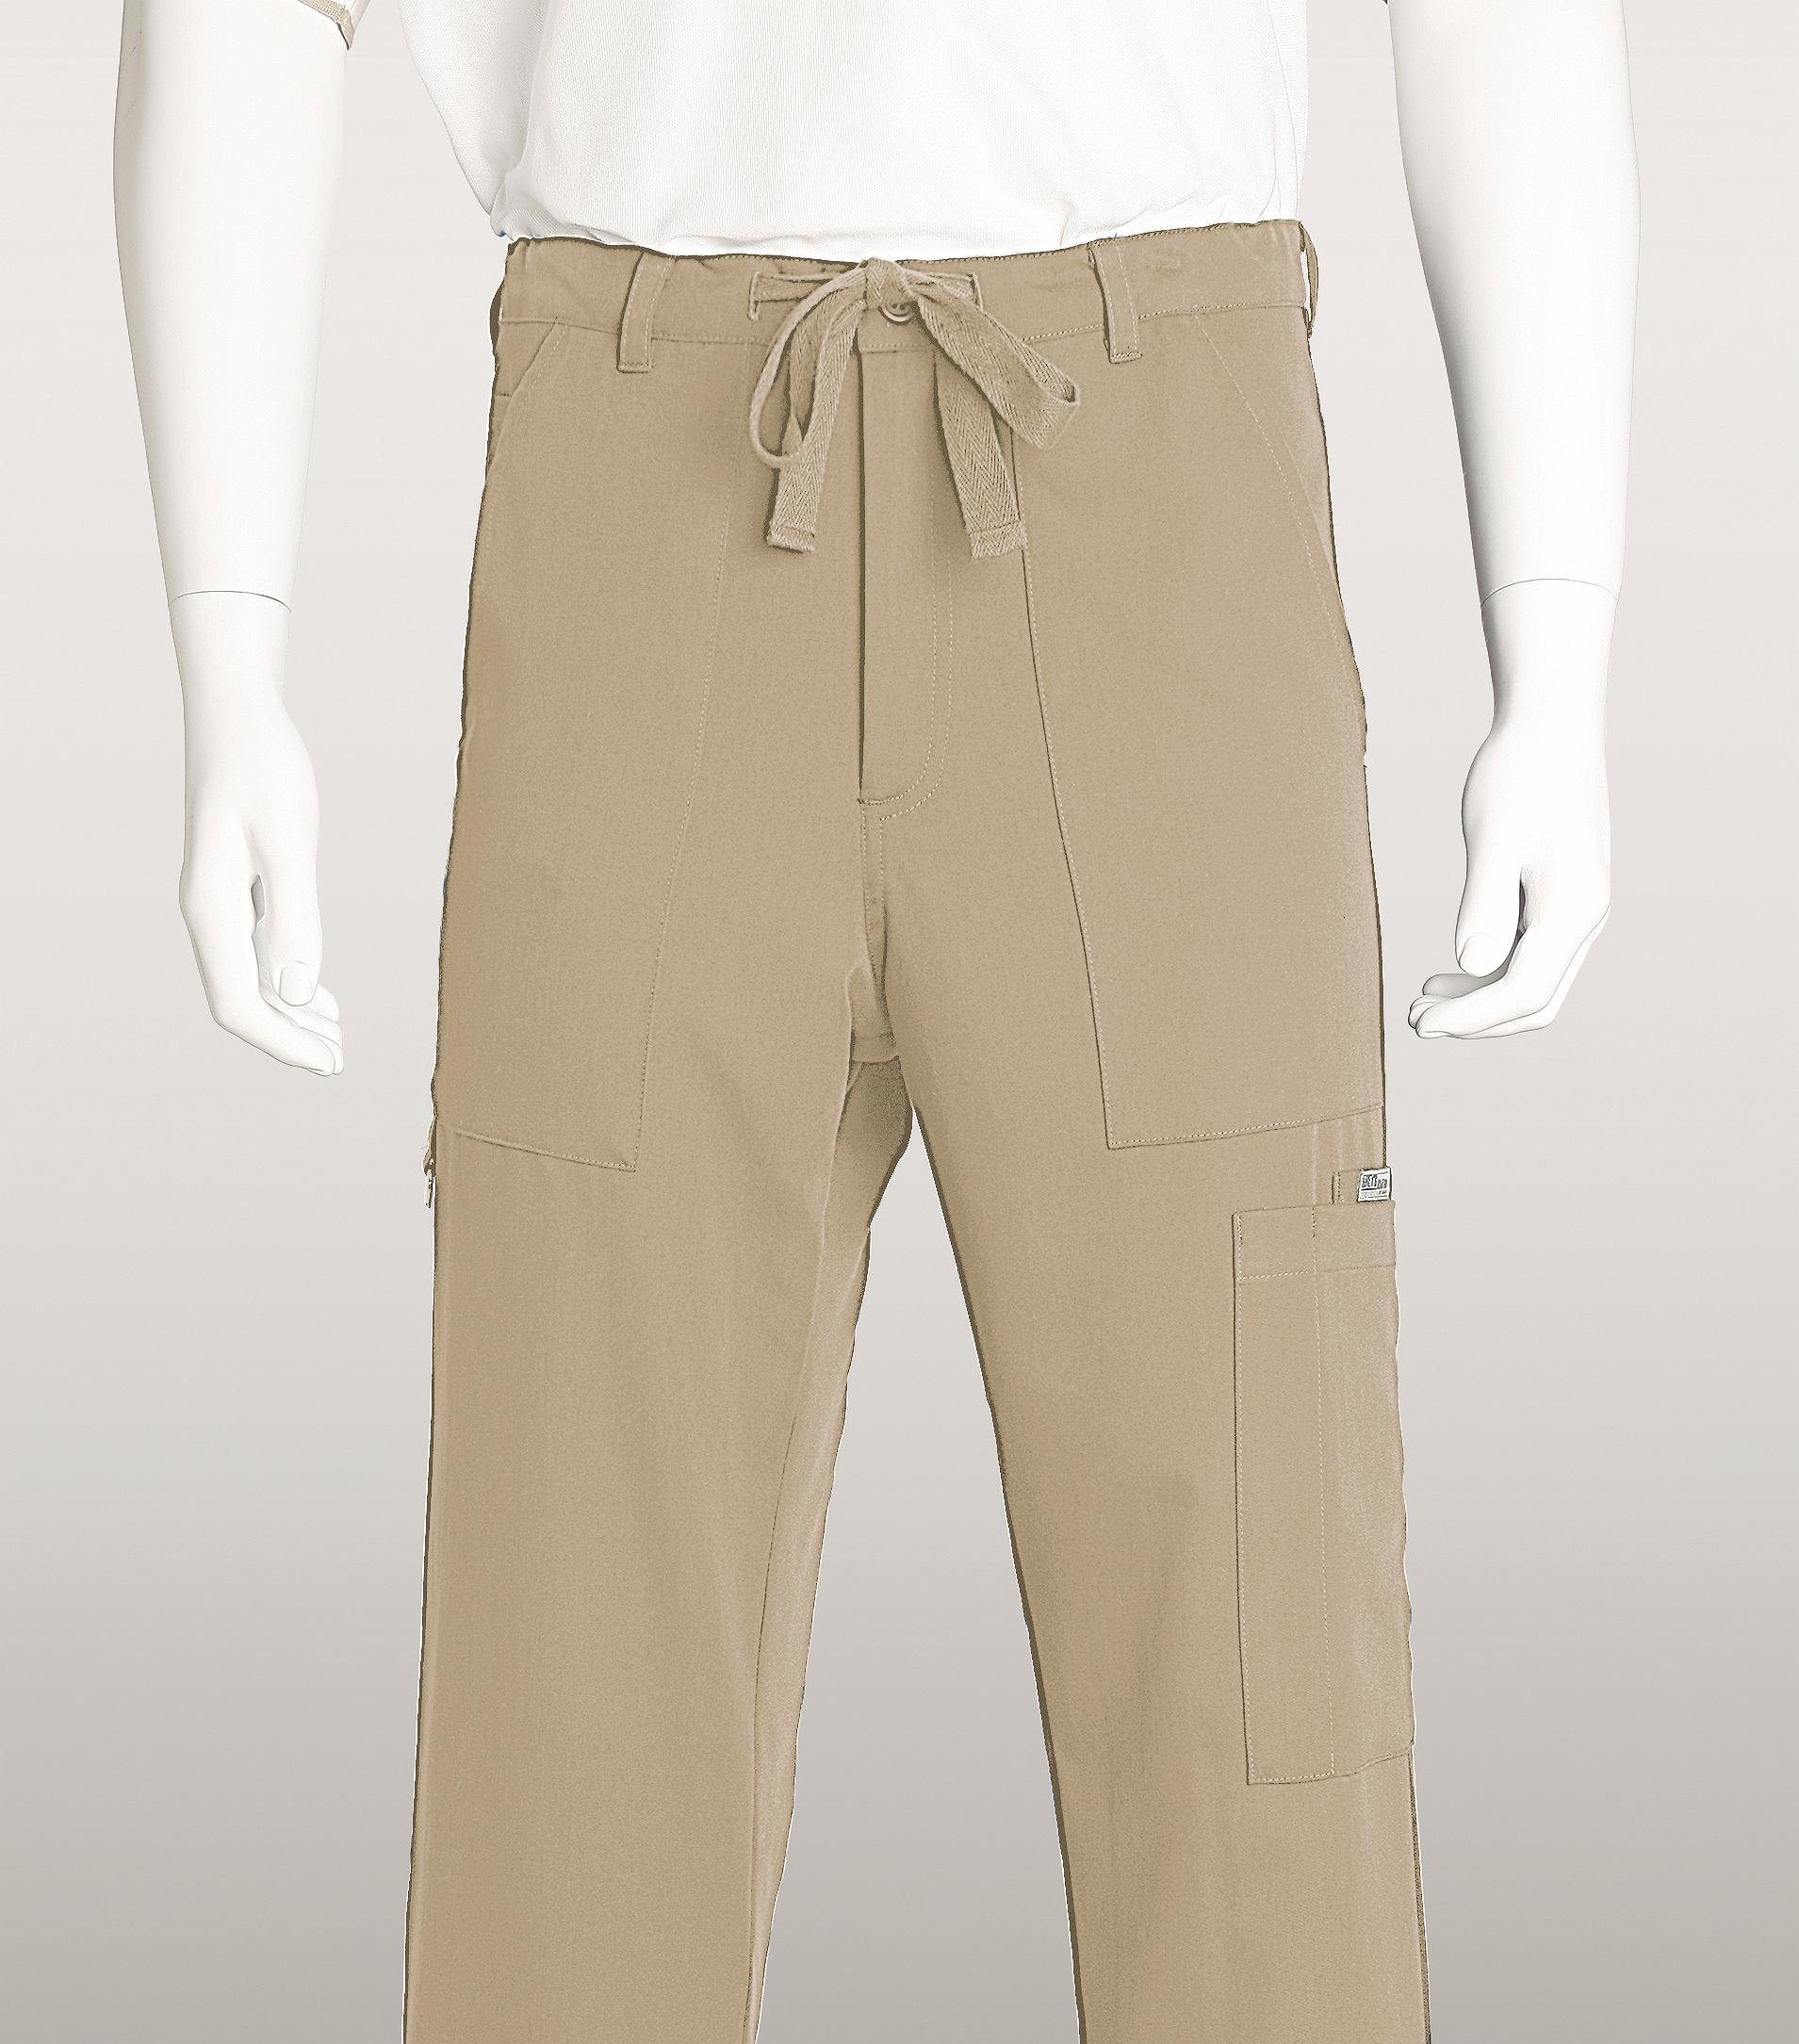 Grey\'s Anatomy Men\'s Zip Fly Drawstring Utility Scrub Pants-0203 ...